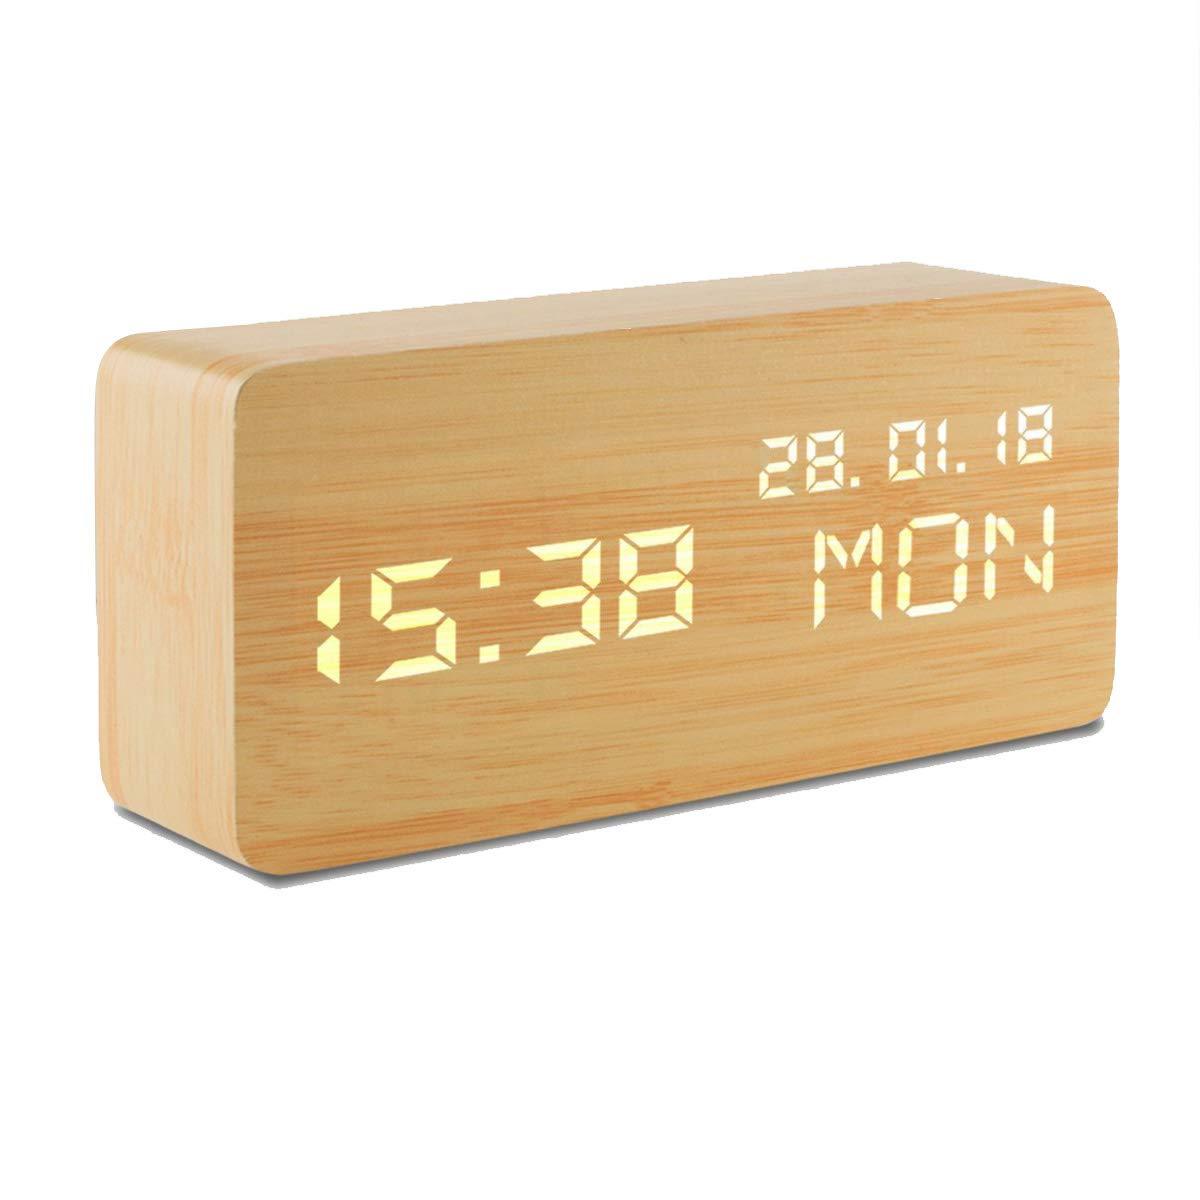 KARID Digital Alarm Clock,Wooden LED Alarm Clock,Displays Time Date Week And Temperature,Cube Wood-shaped Sound Control Desk Alarm Clock for Kid,Home,Office,Daily Life,Heavy Sleepers KaiRuiJieMaoYi Co. Ltd